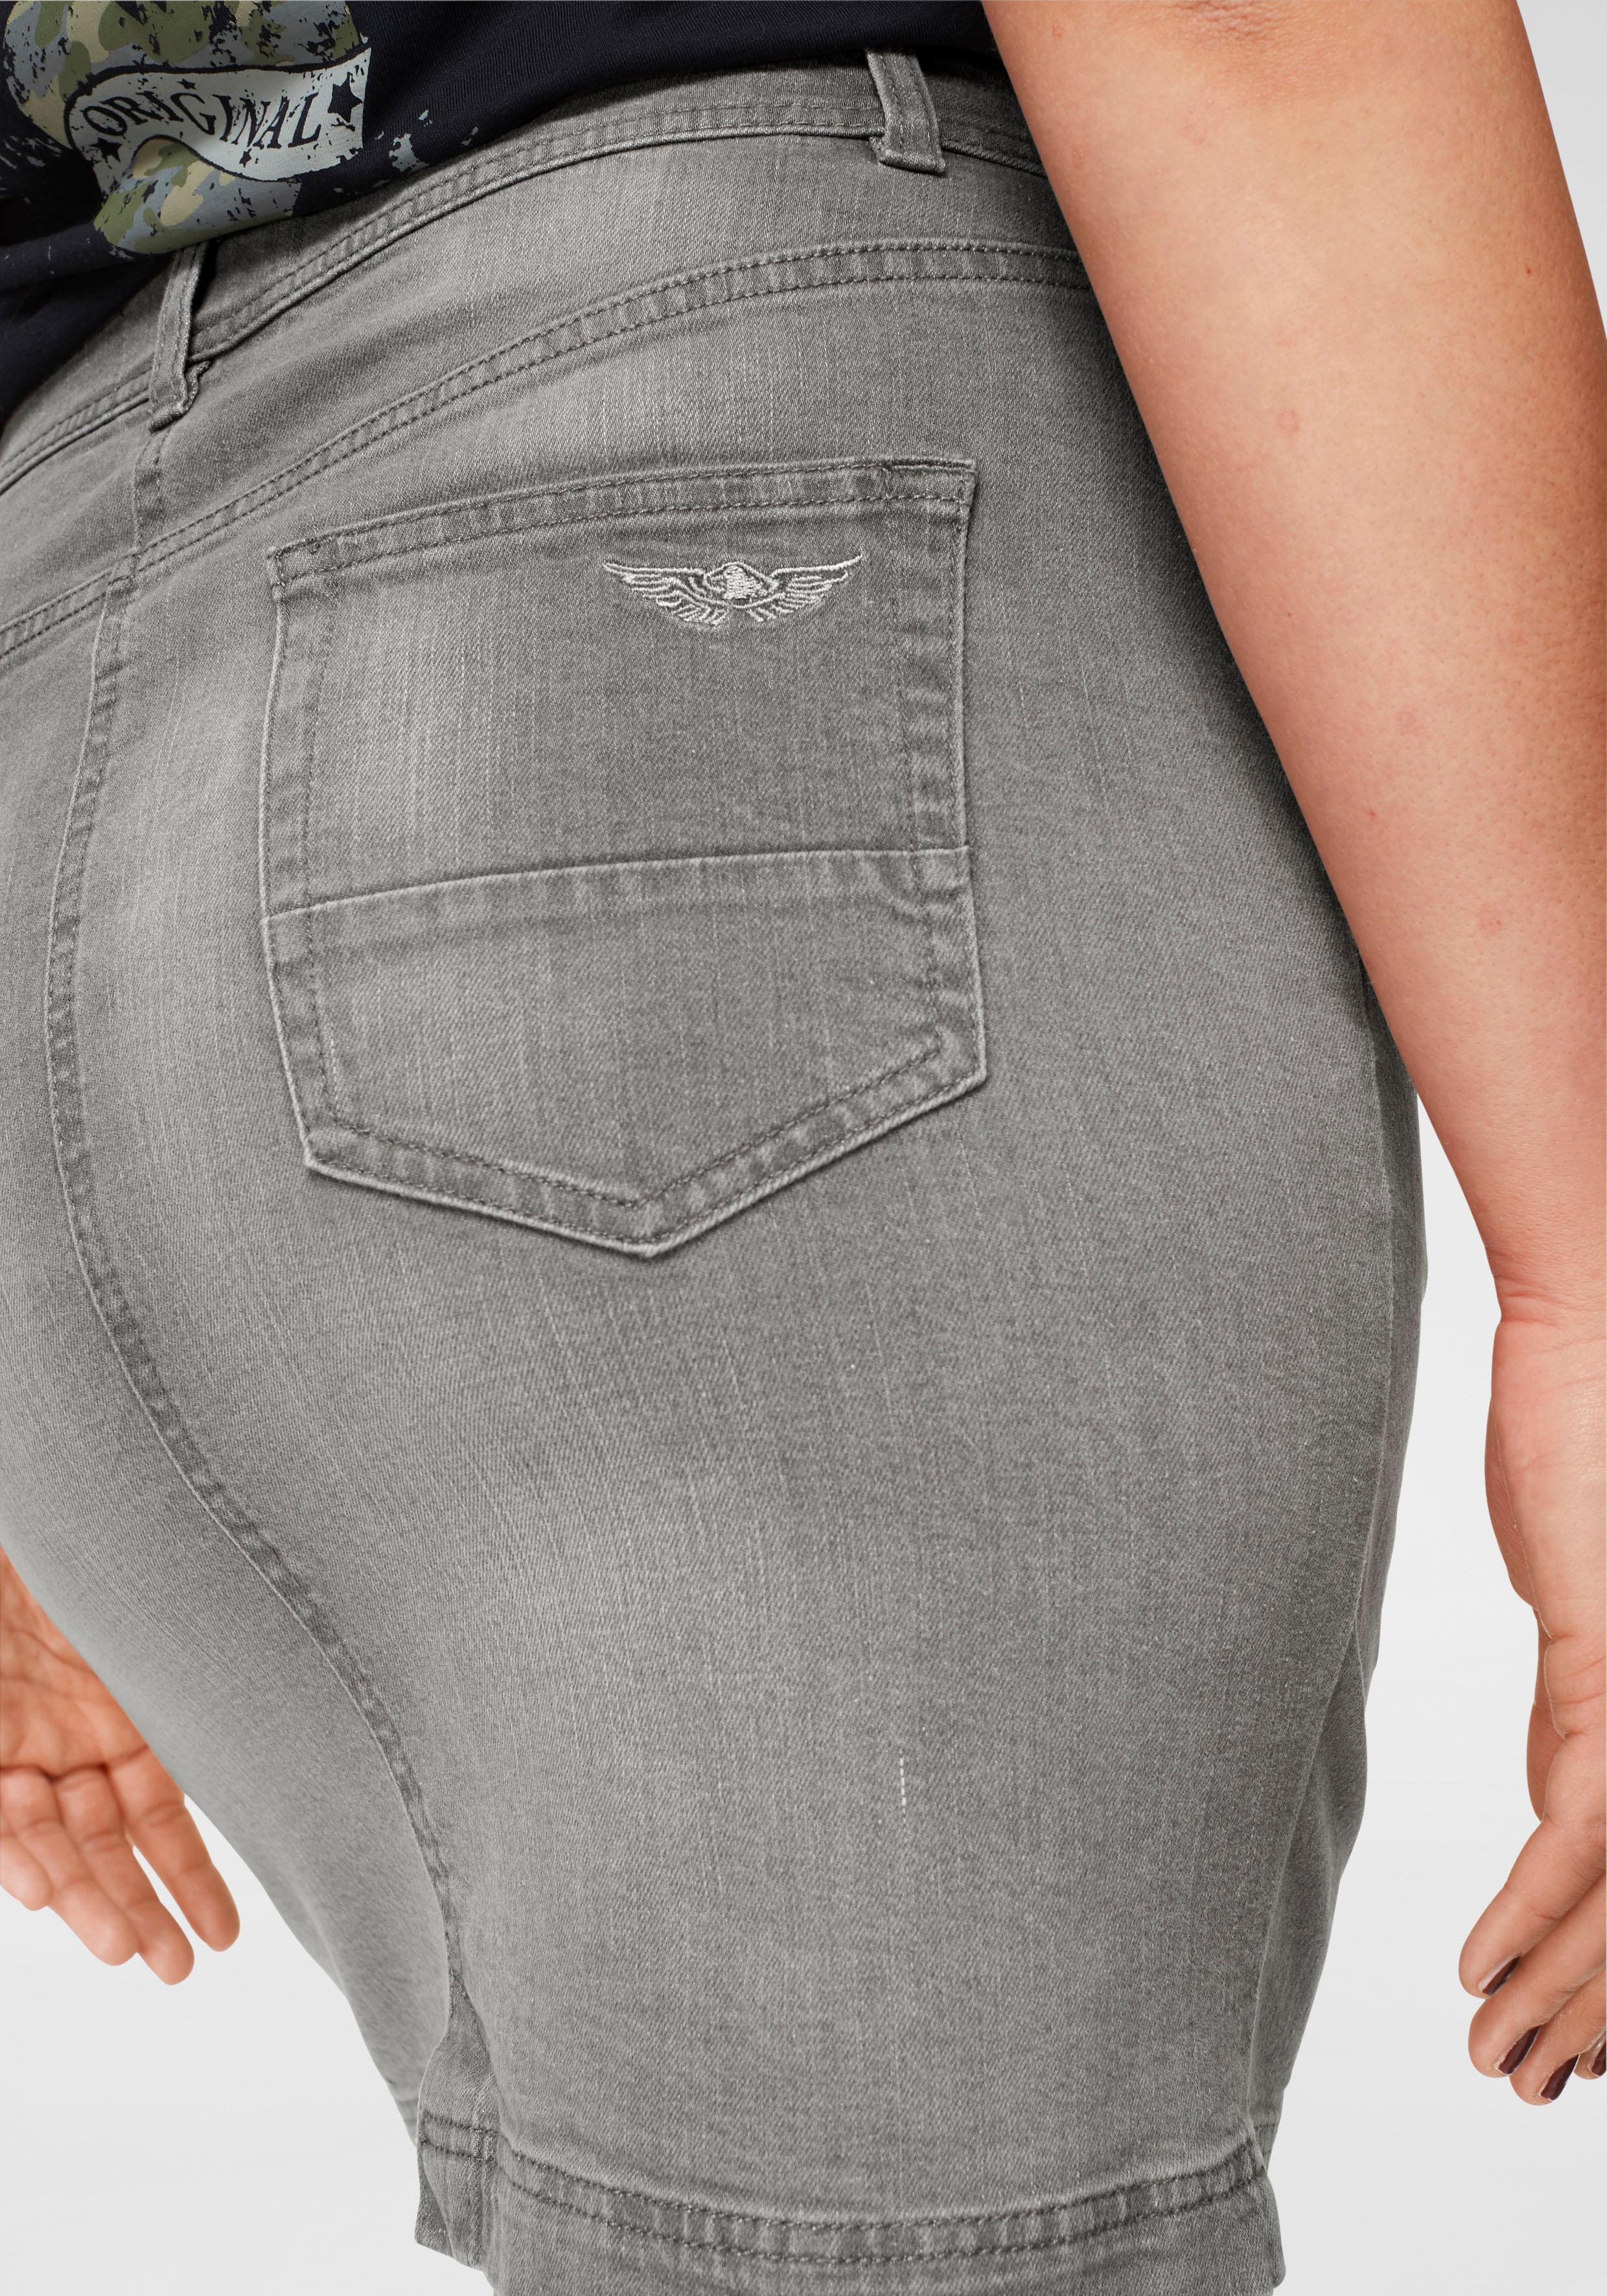 1f63519f348a Details zu Jeansrock Damen Mit Sichtbarer Knopfleiste Röcke Arizona Basics